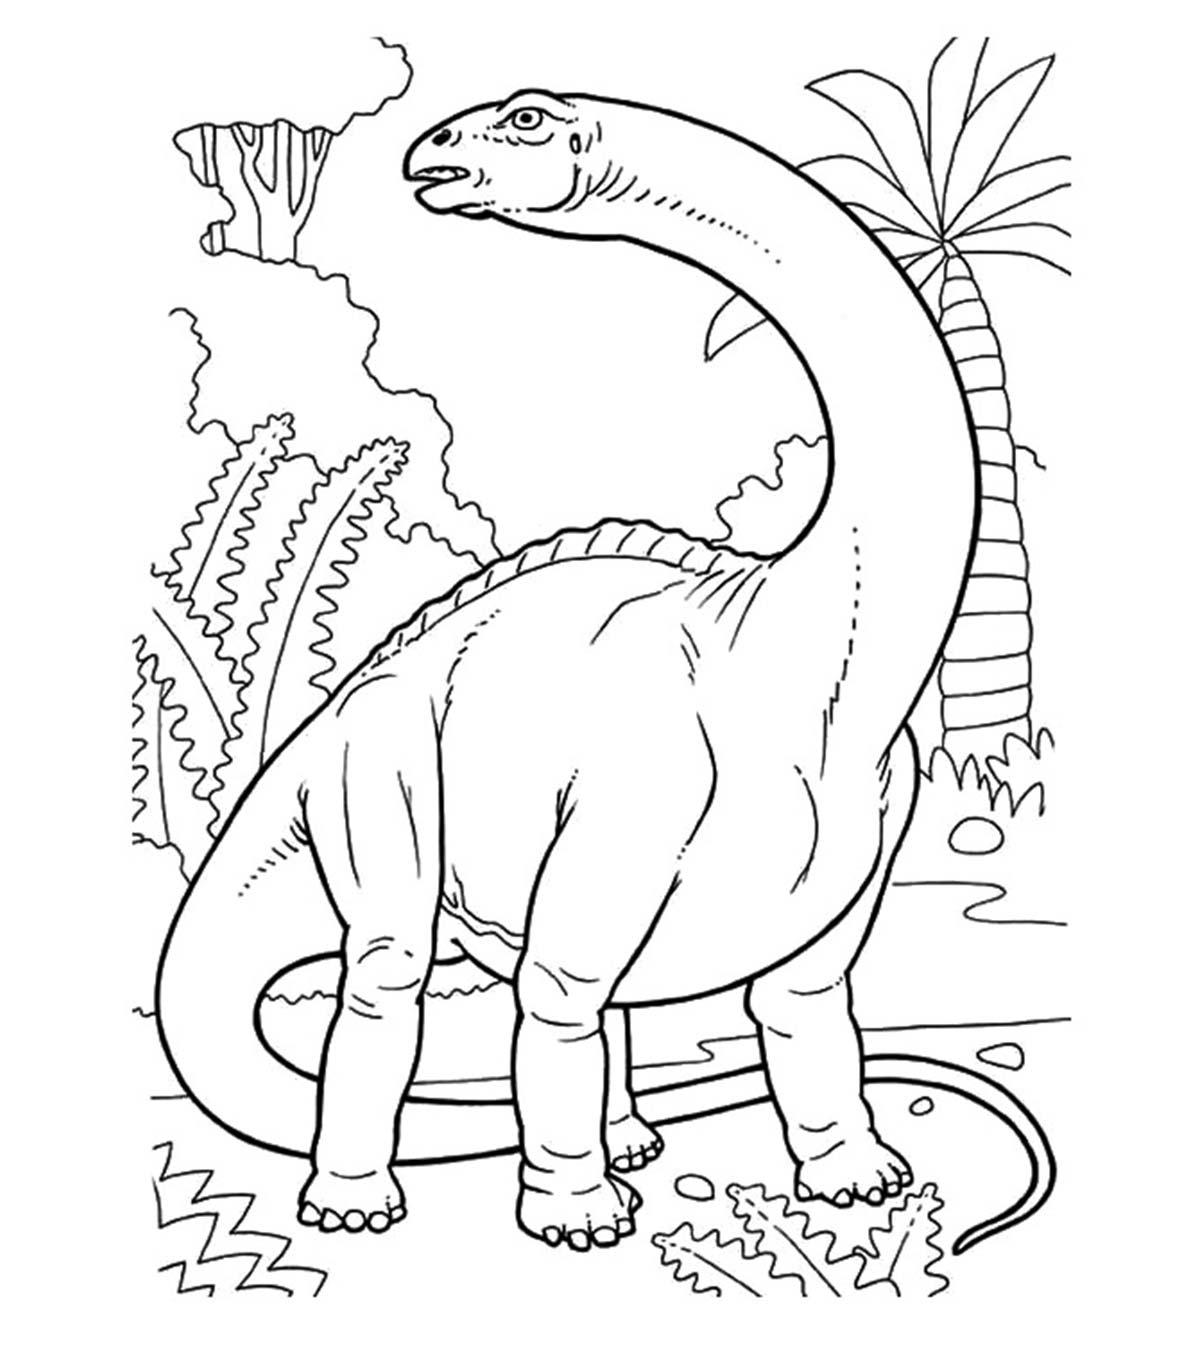 Dinossauro único